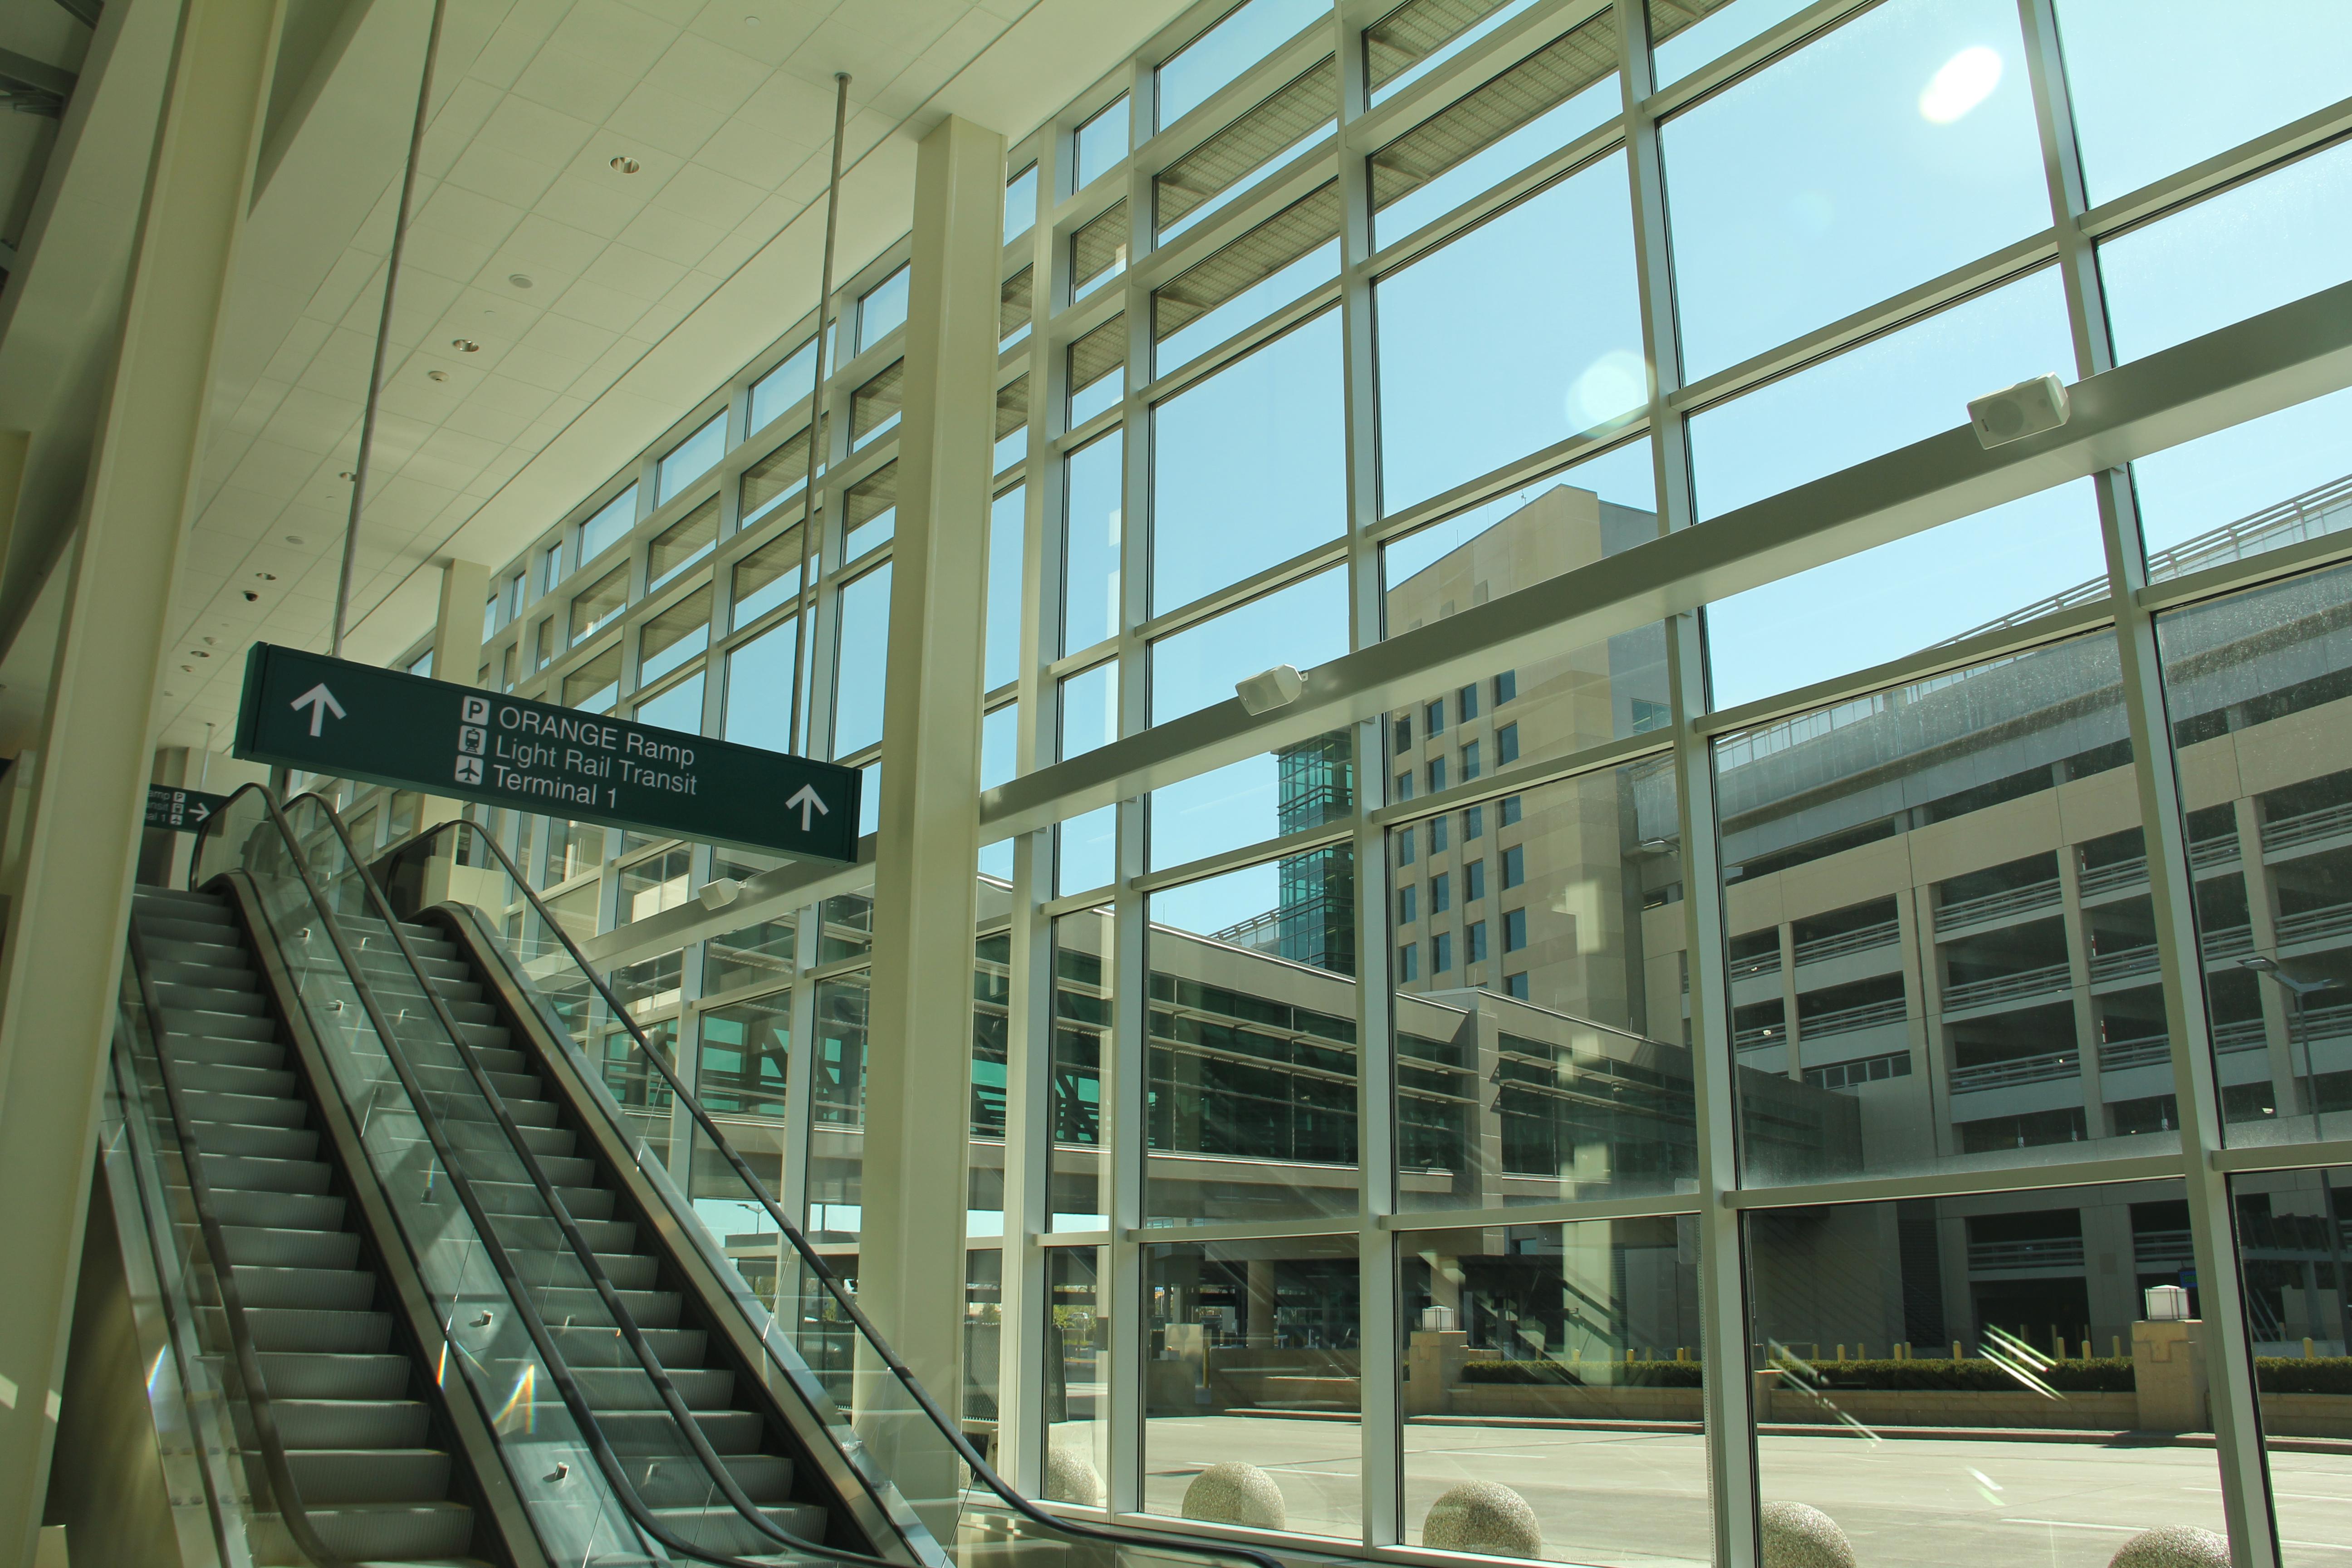 Minneapolis – St. Paul Airport